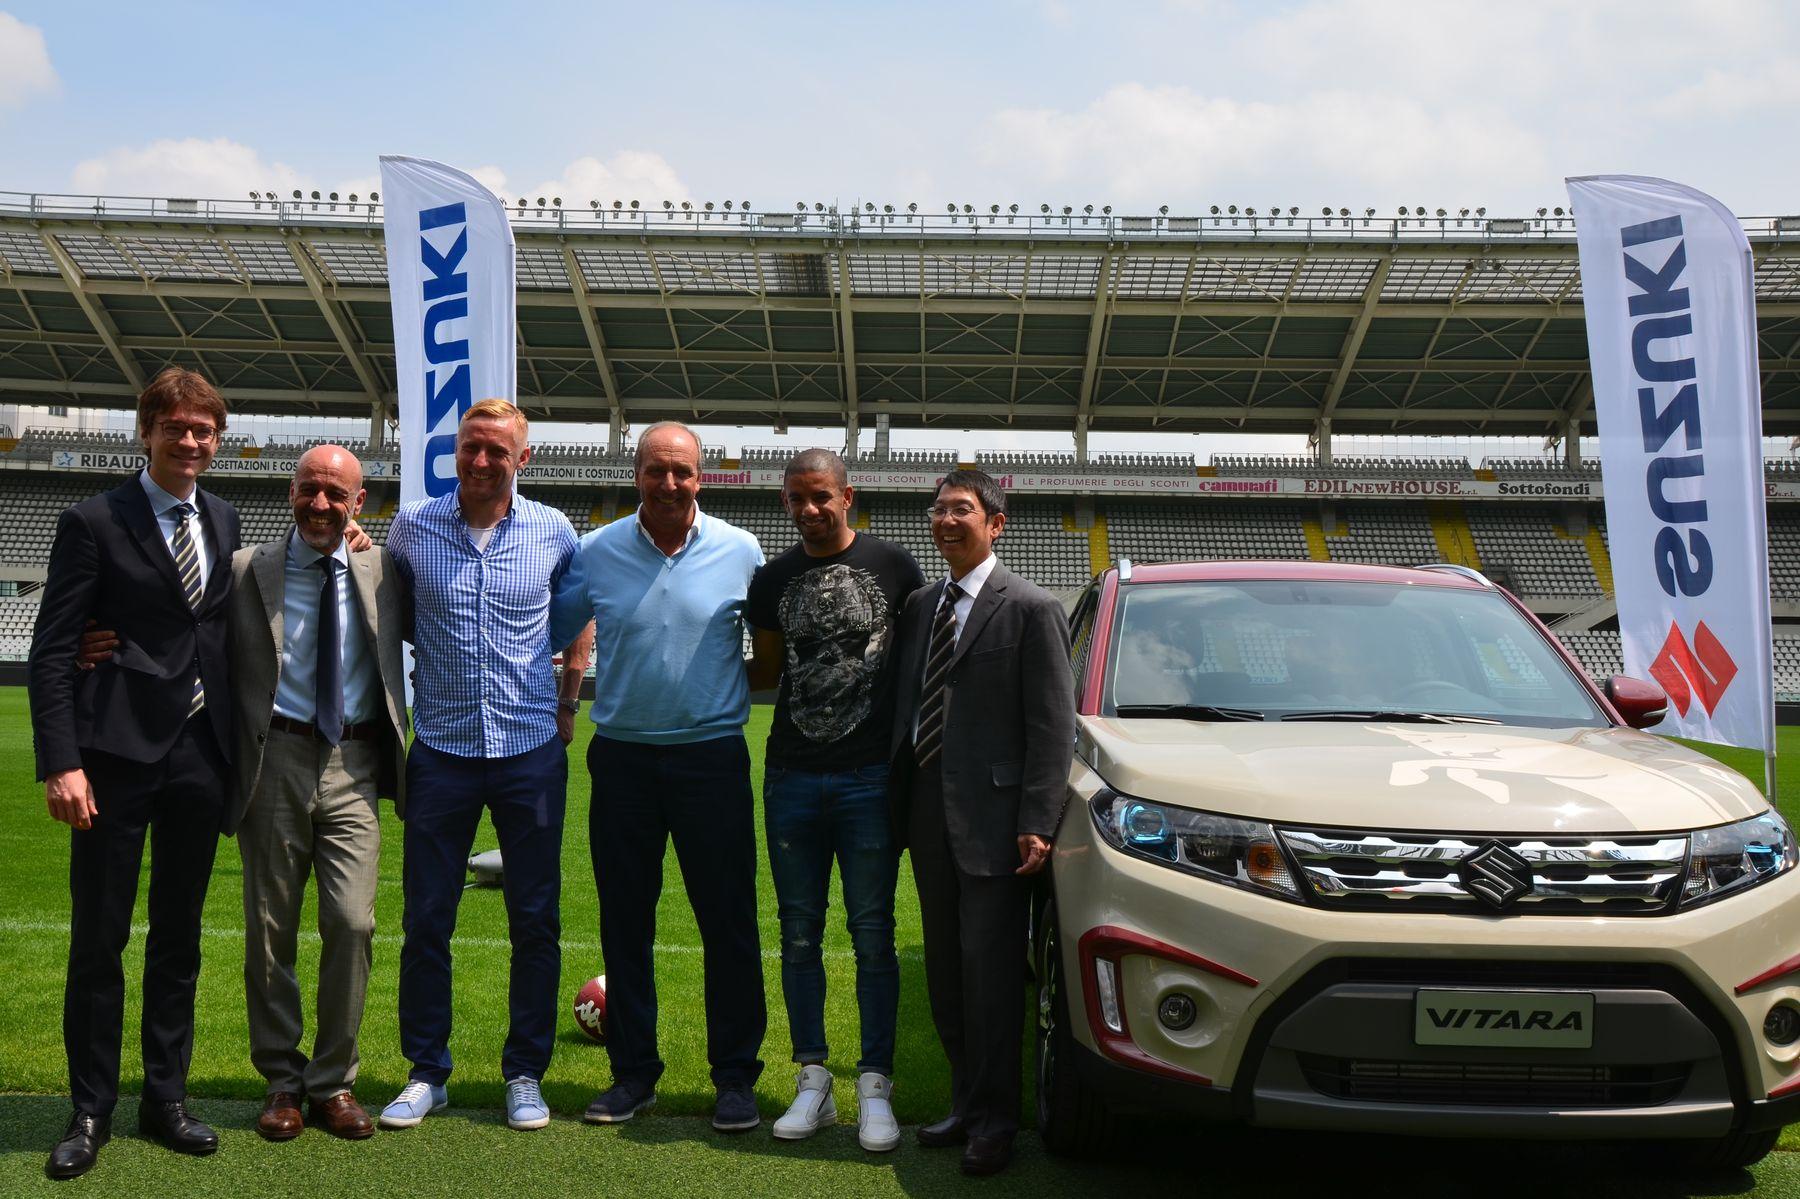 Nuova Suzuki Vitara Toro Edition